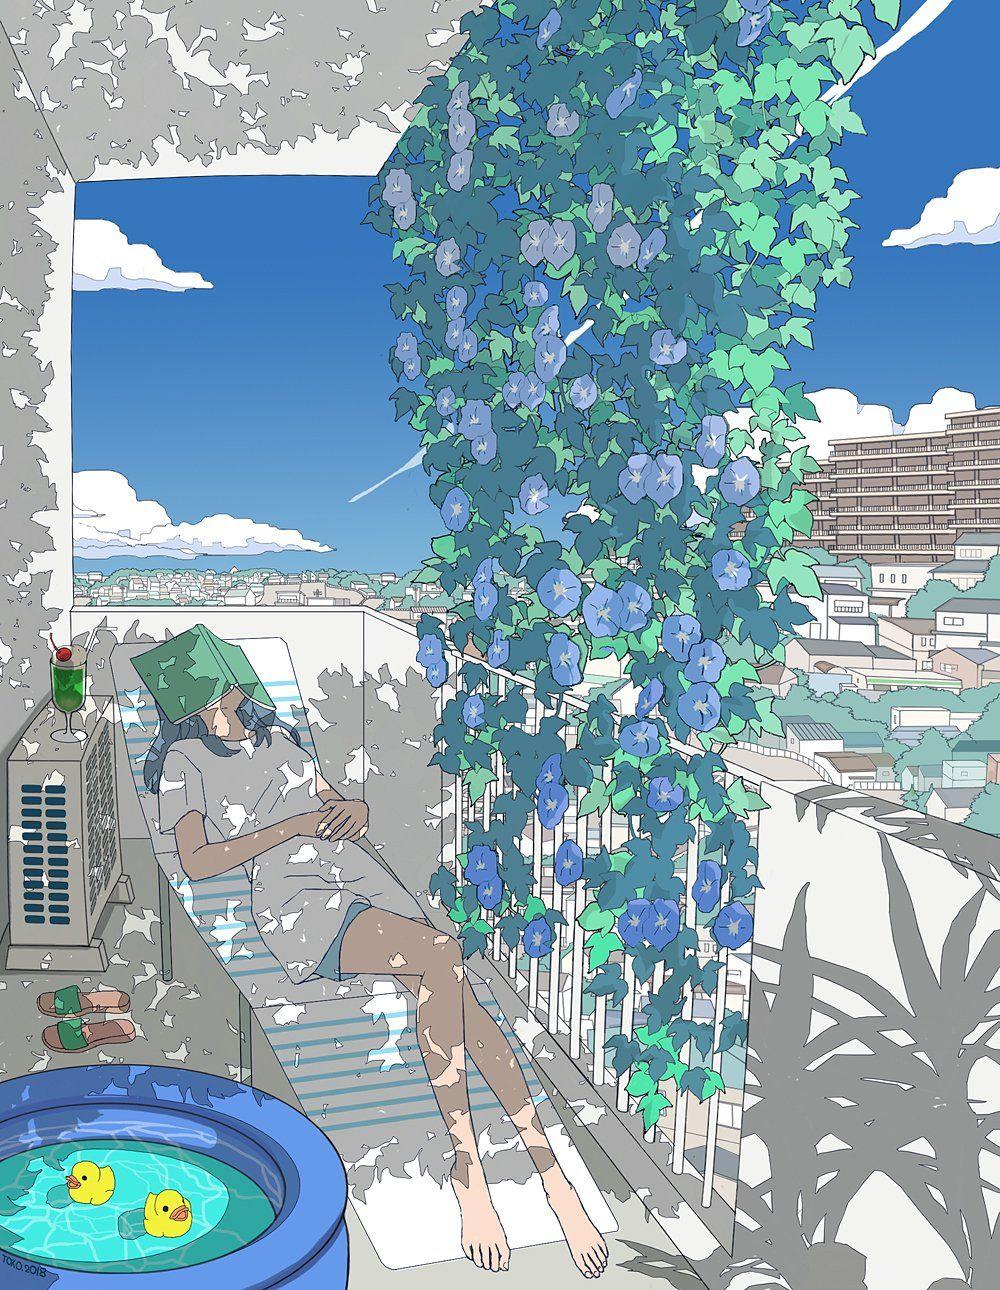 aesthetic anime school background outside